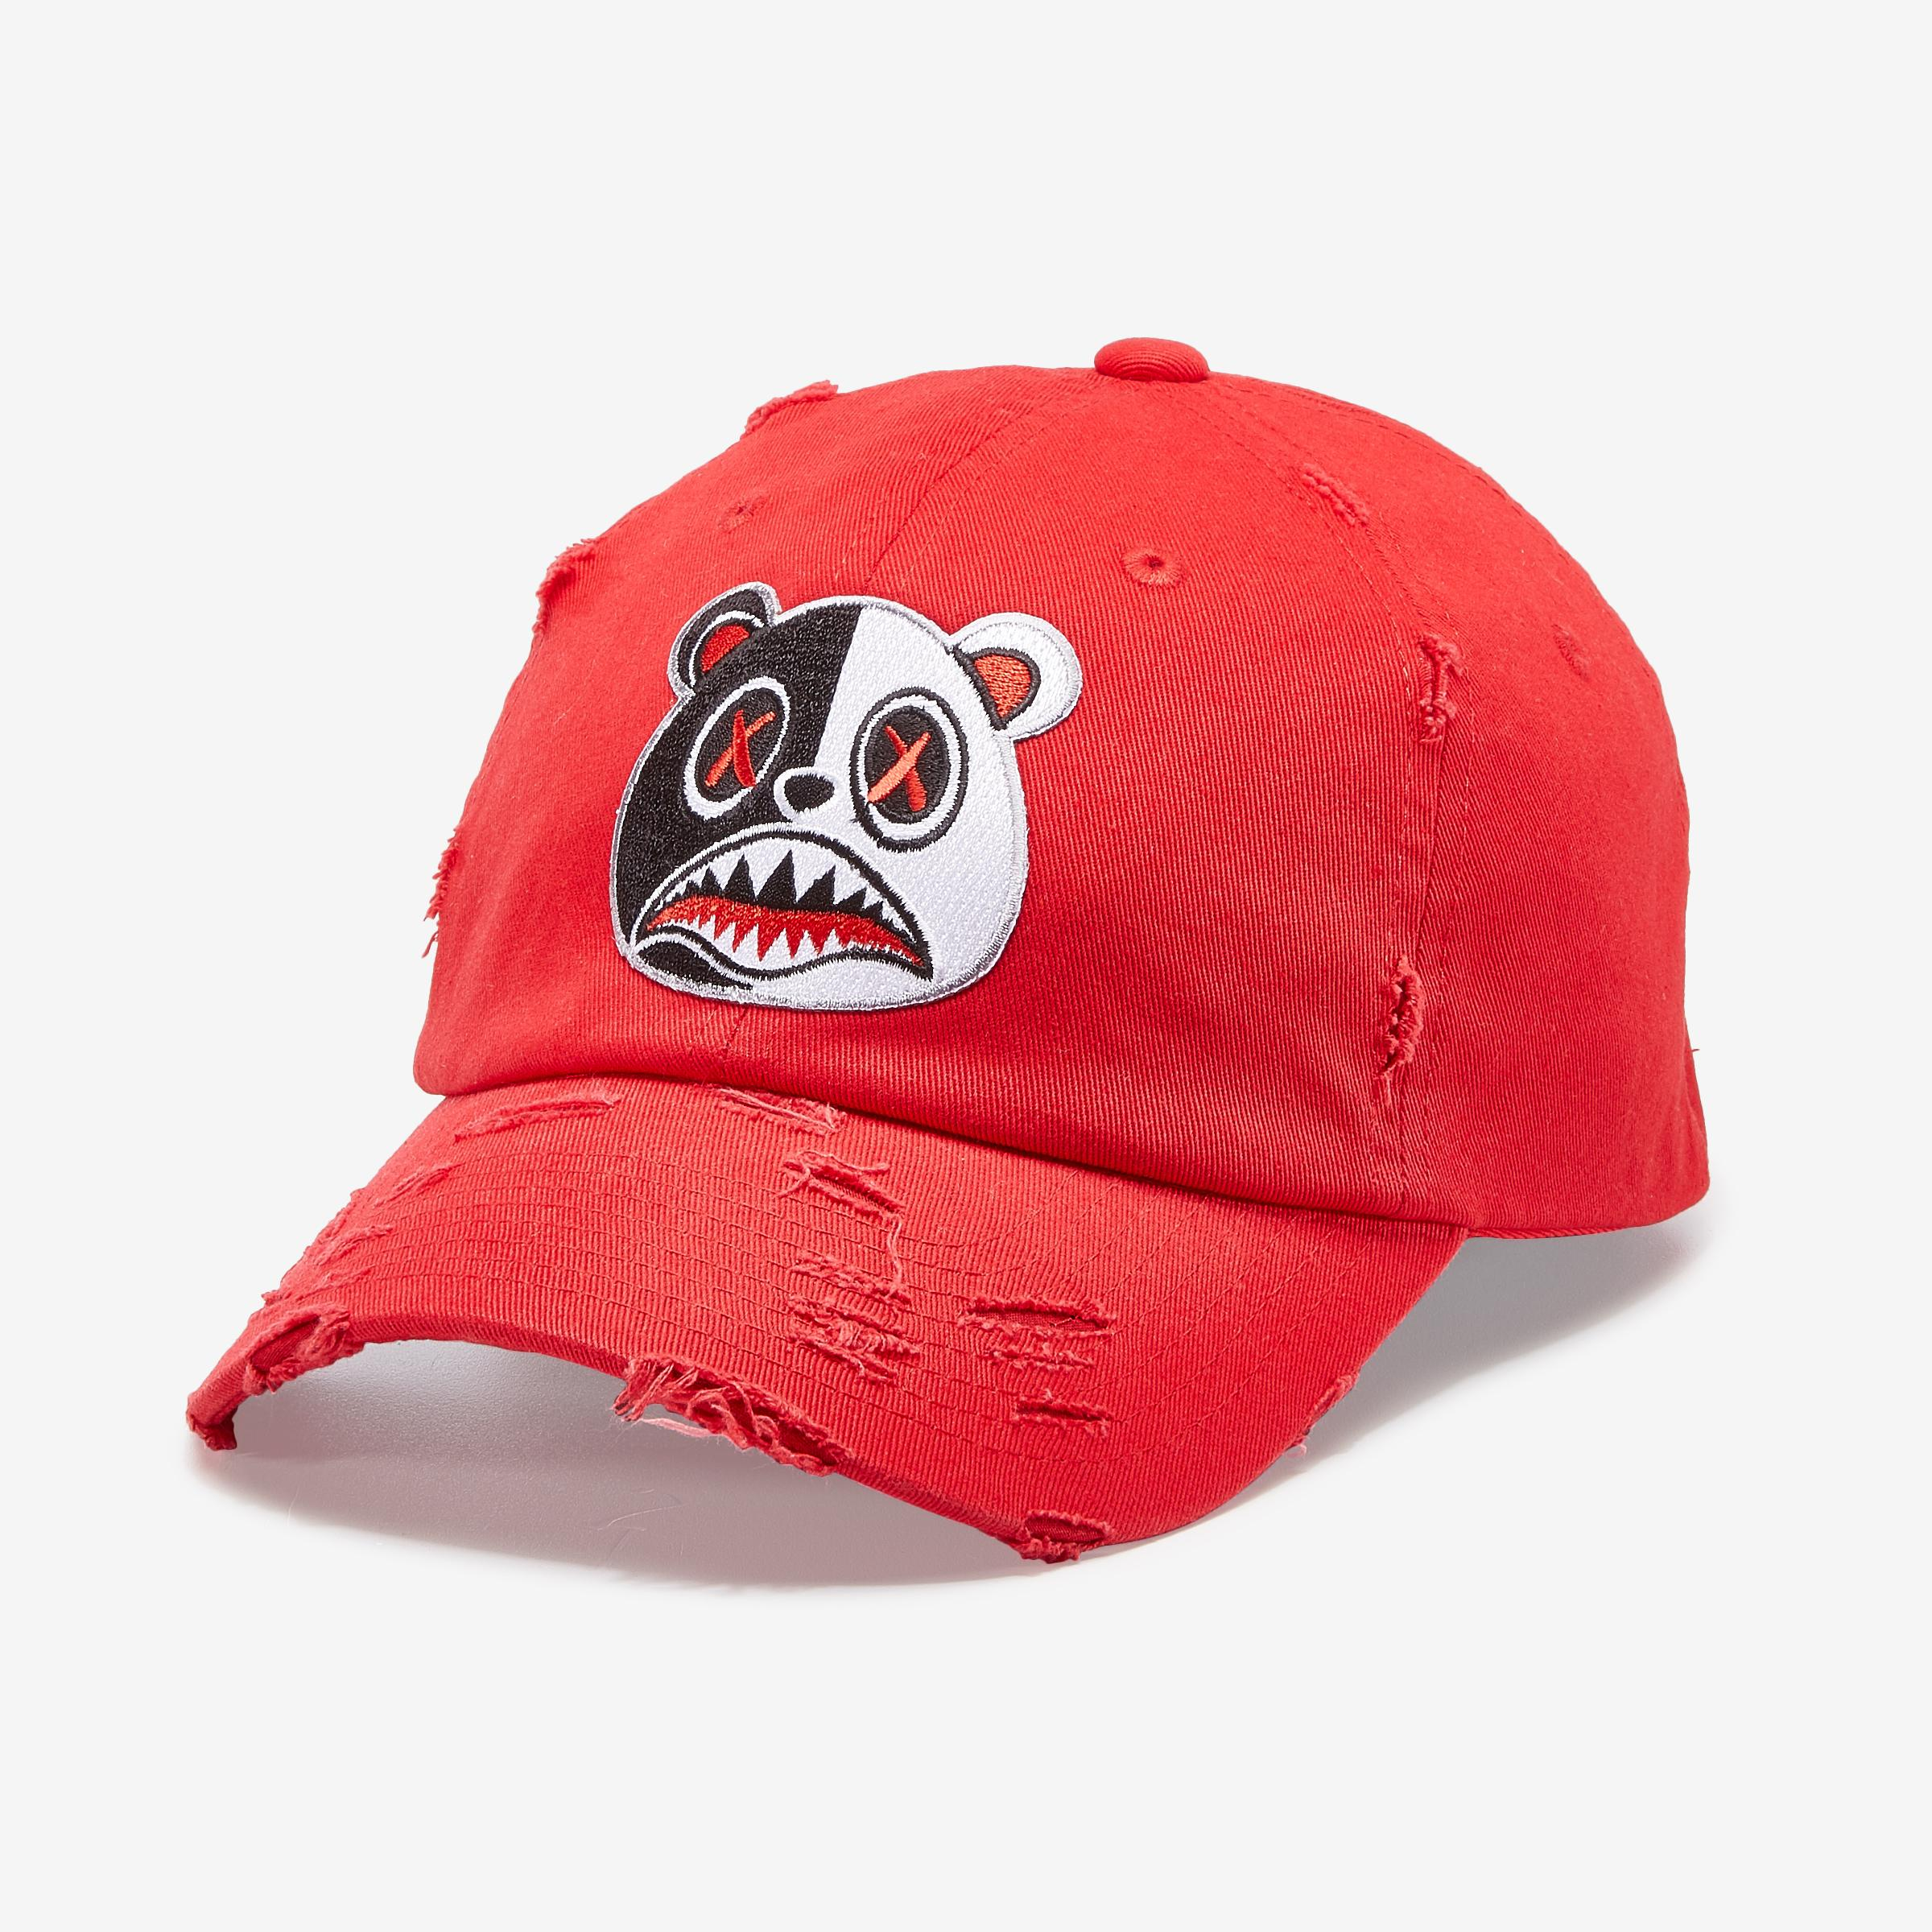 Scar Baws Hat